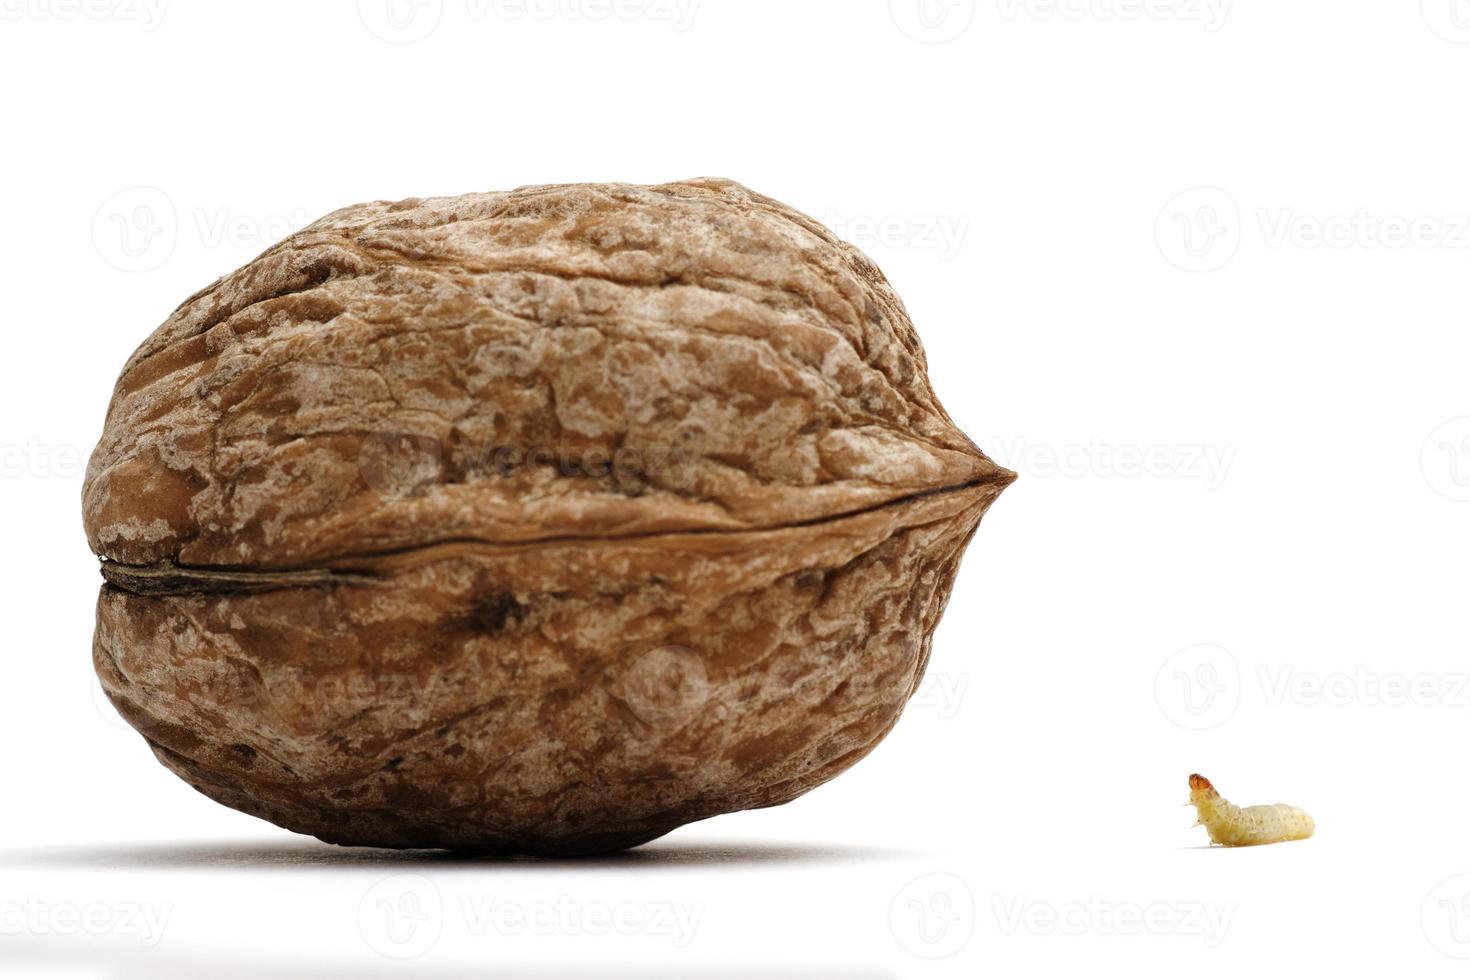 Worm and a walnut photo